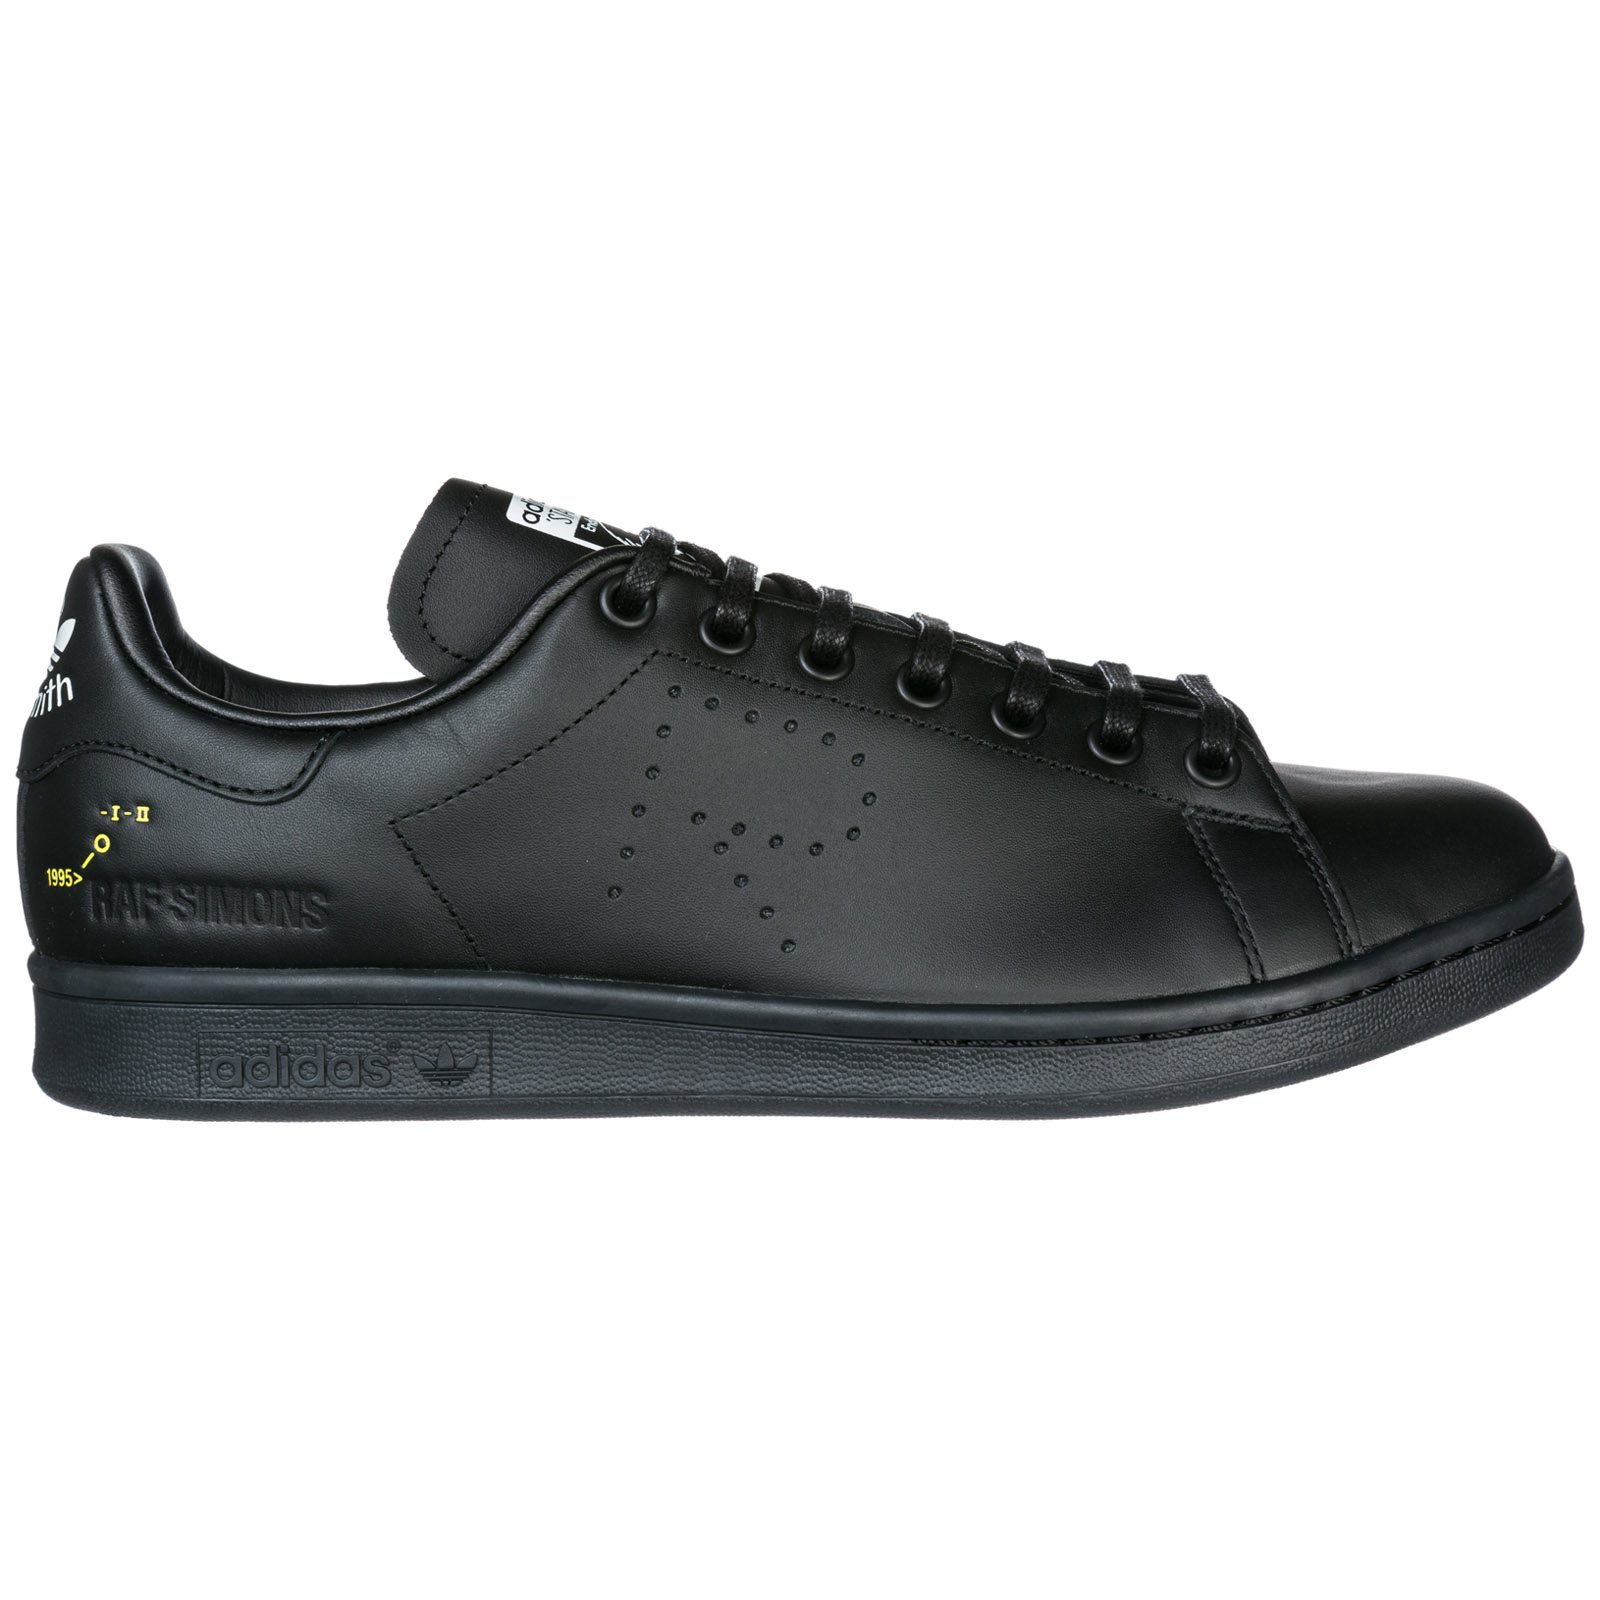 Sneakers Adidas by Raf Simons stan smith F34257 nero | FRMODA.com